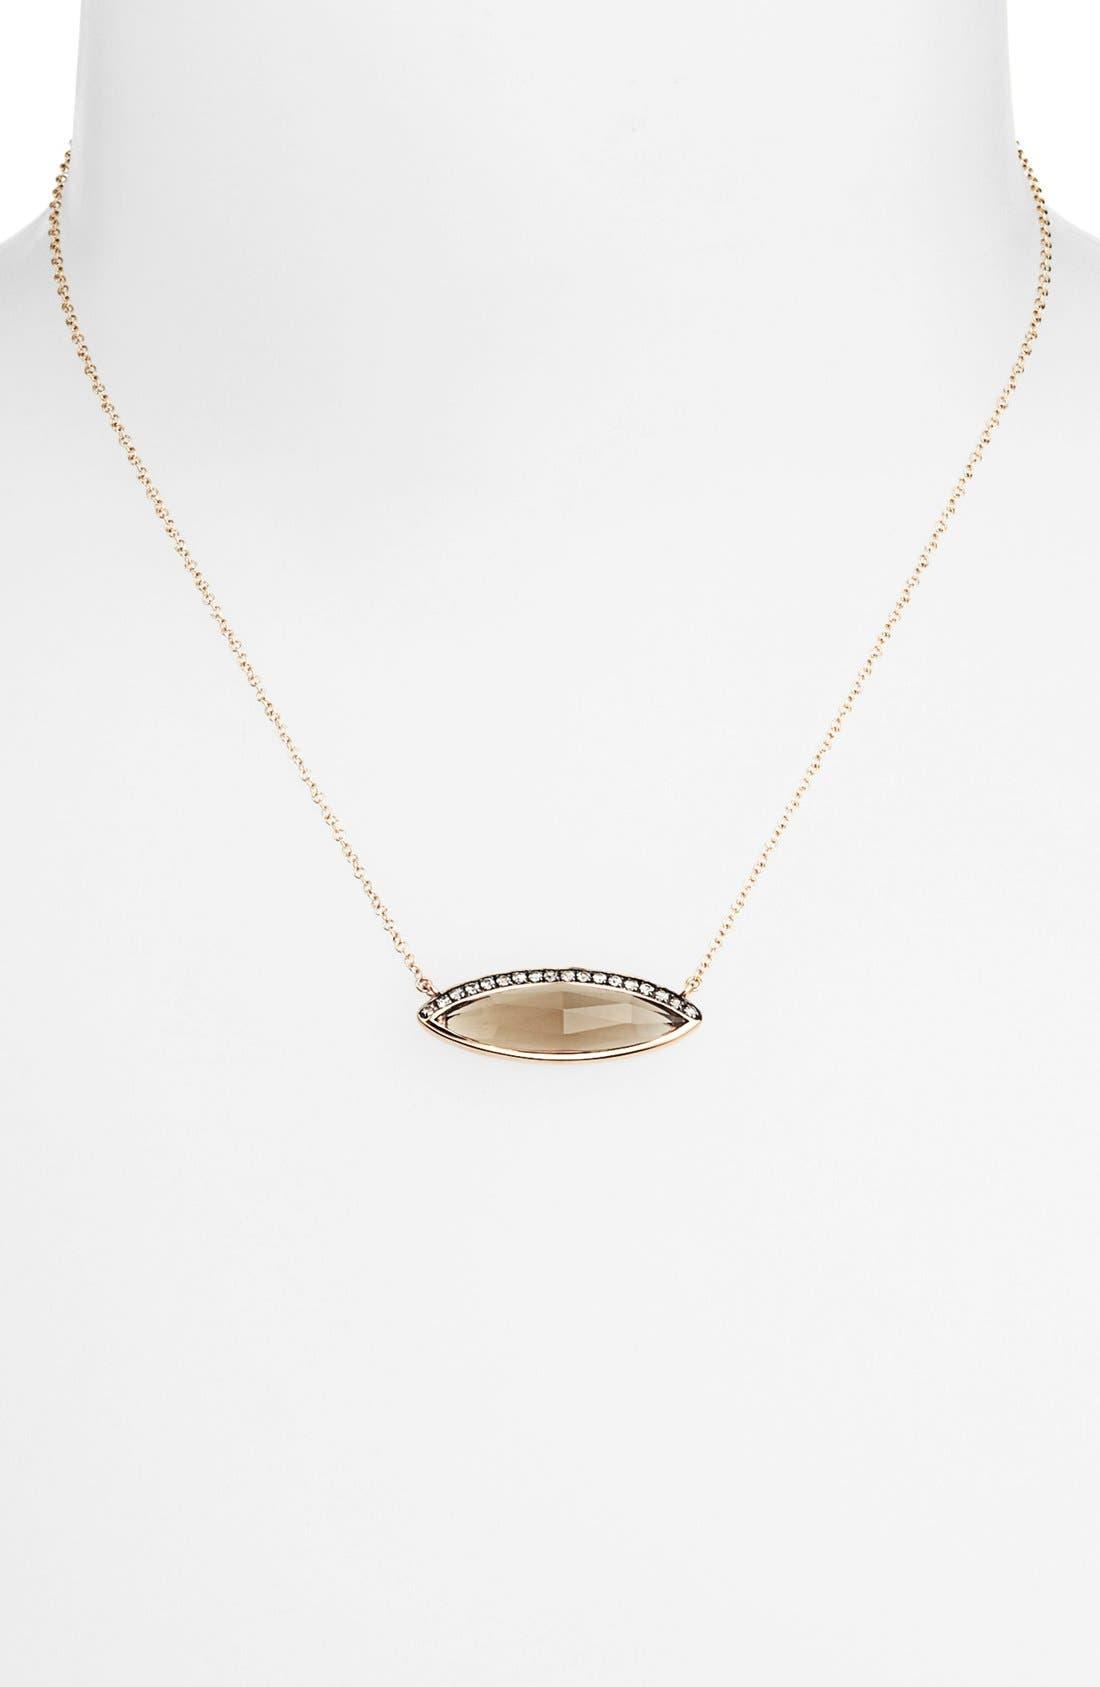 Alternate Image 1 Selected - Whitney Stern Pendant Necklace